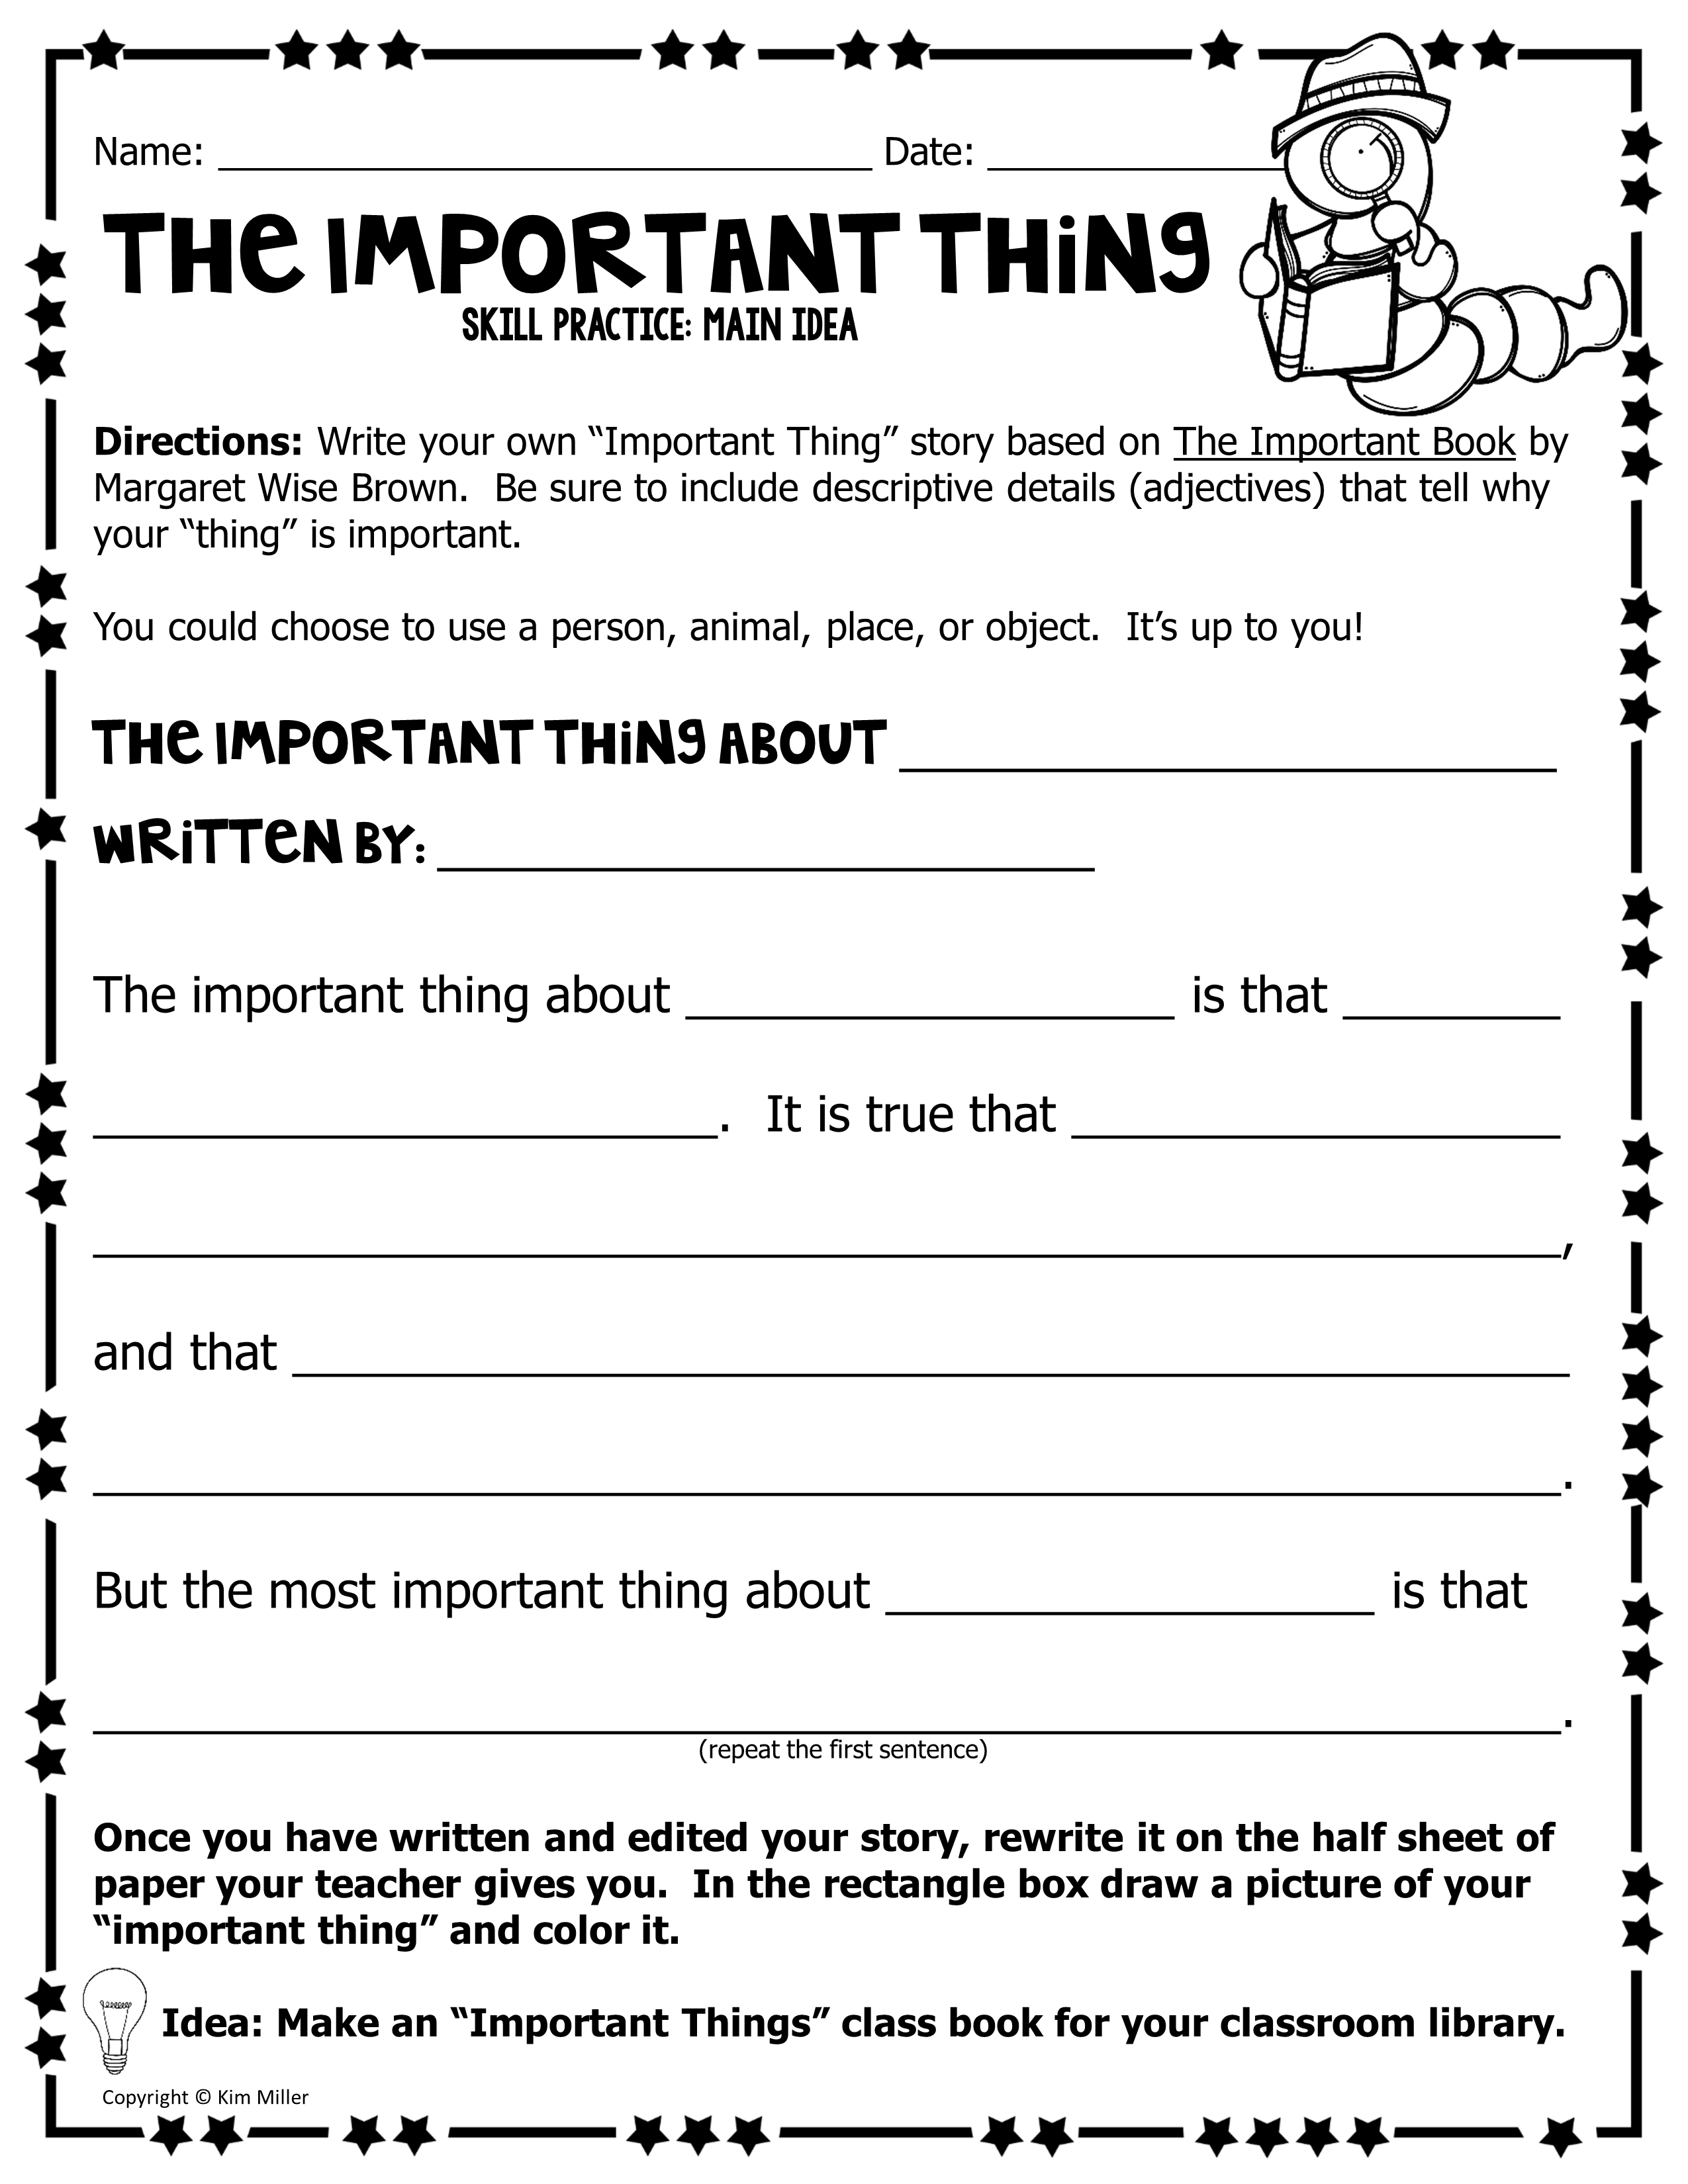 The Important Thing - Main Idea